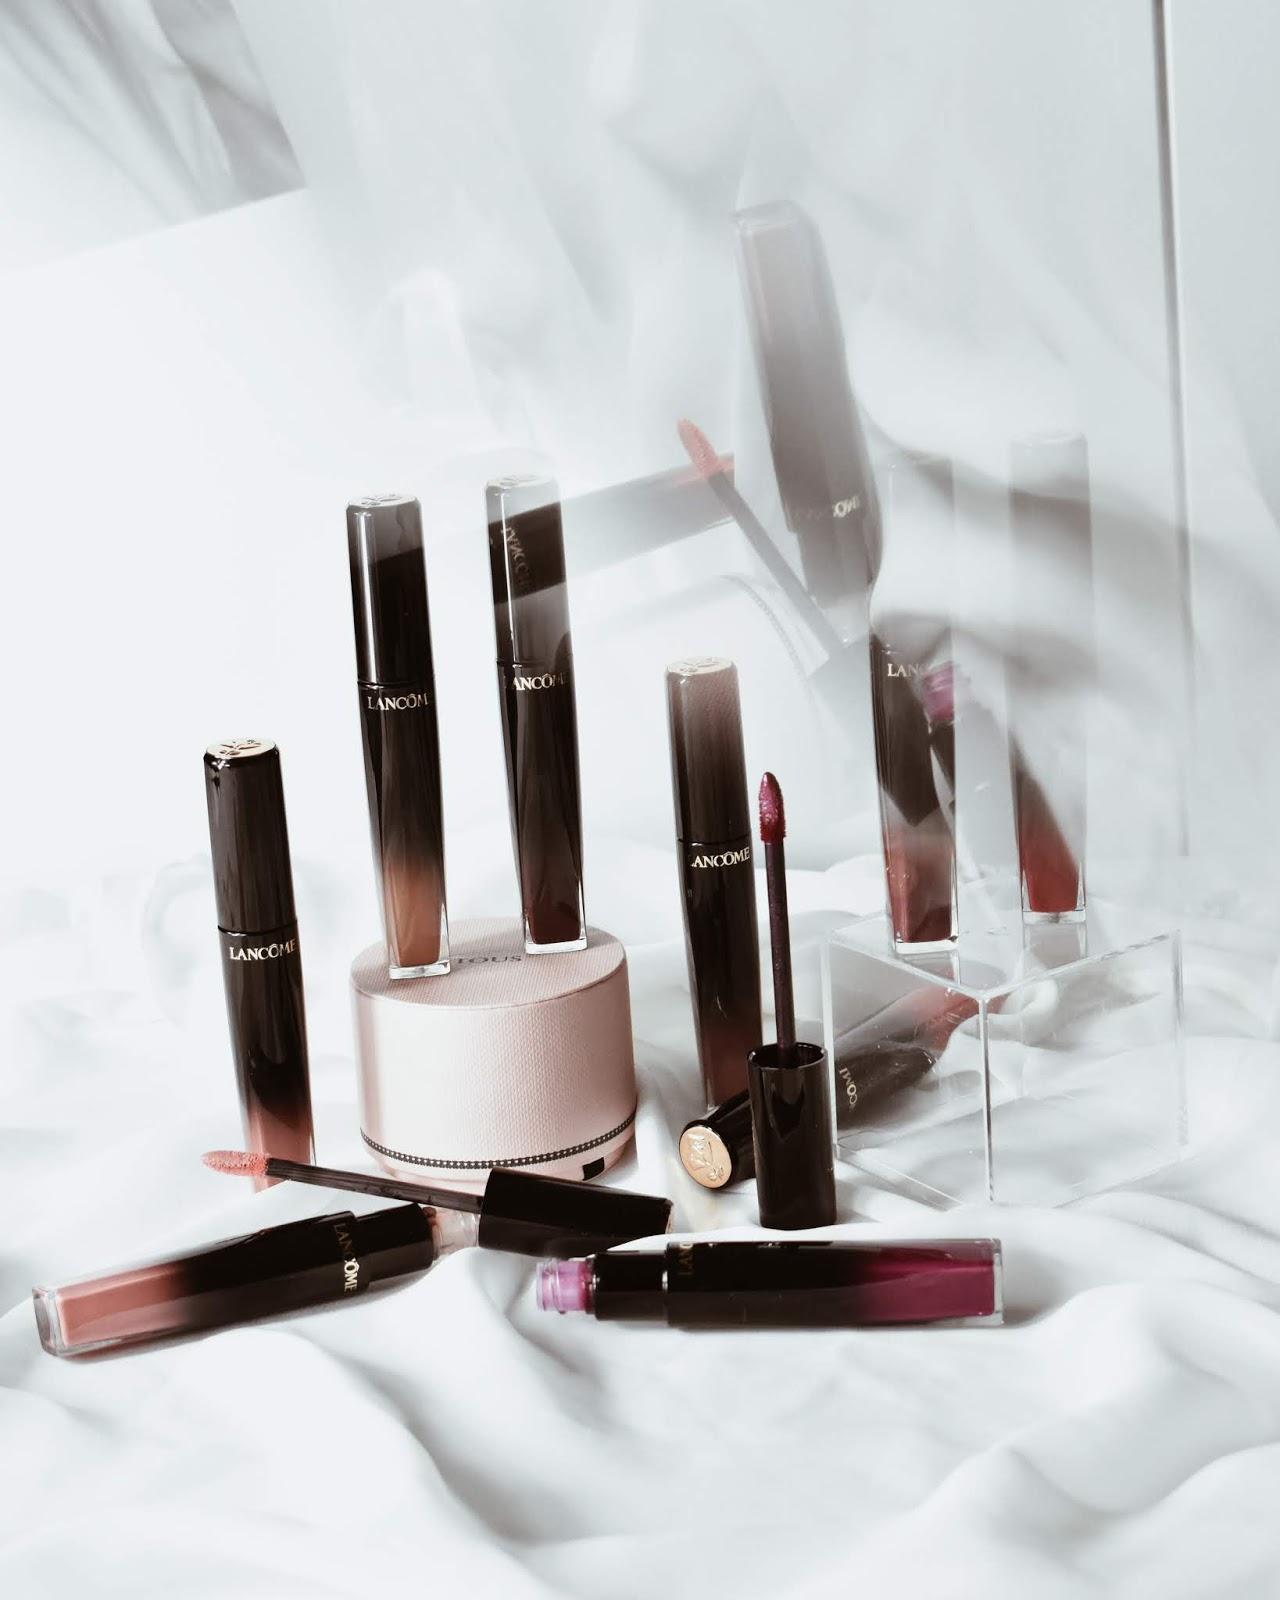 lancome labsolu lacquer lacquers l'absolu tint gloss tintas labios lacadas brillo beauty blogger de belleza mexicana siham hamdan noirette diary mexico belleza cosmeticos labiales 1